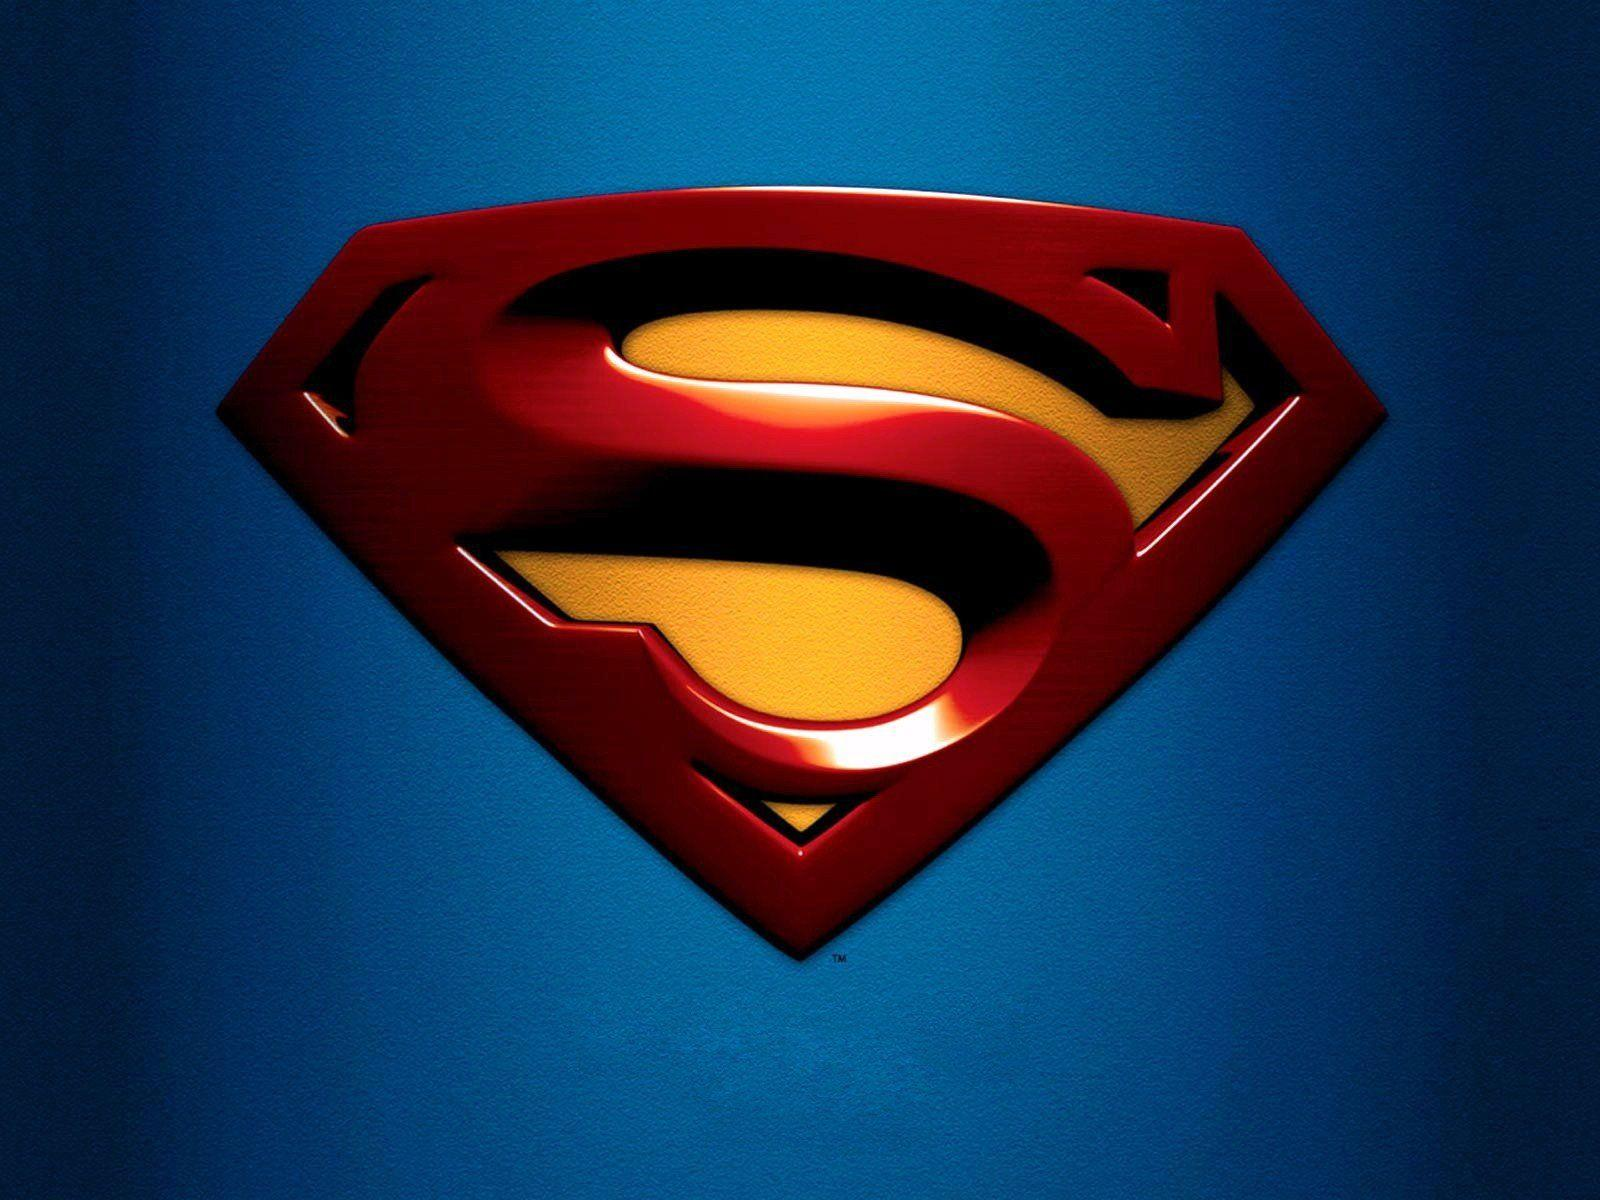 Superman HD.wallpapers - Wallpaper Cave